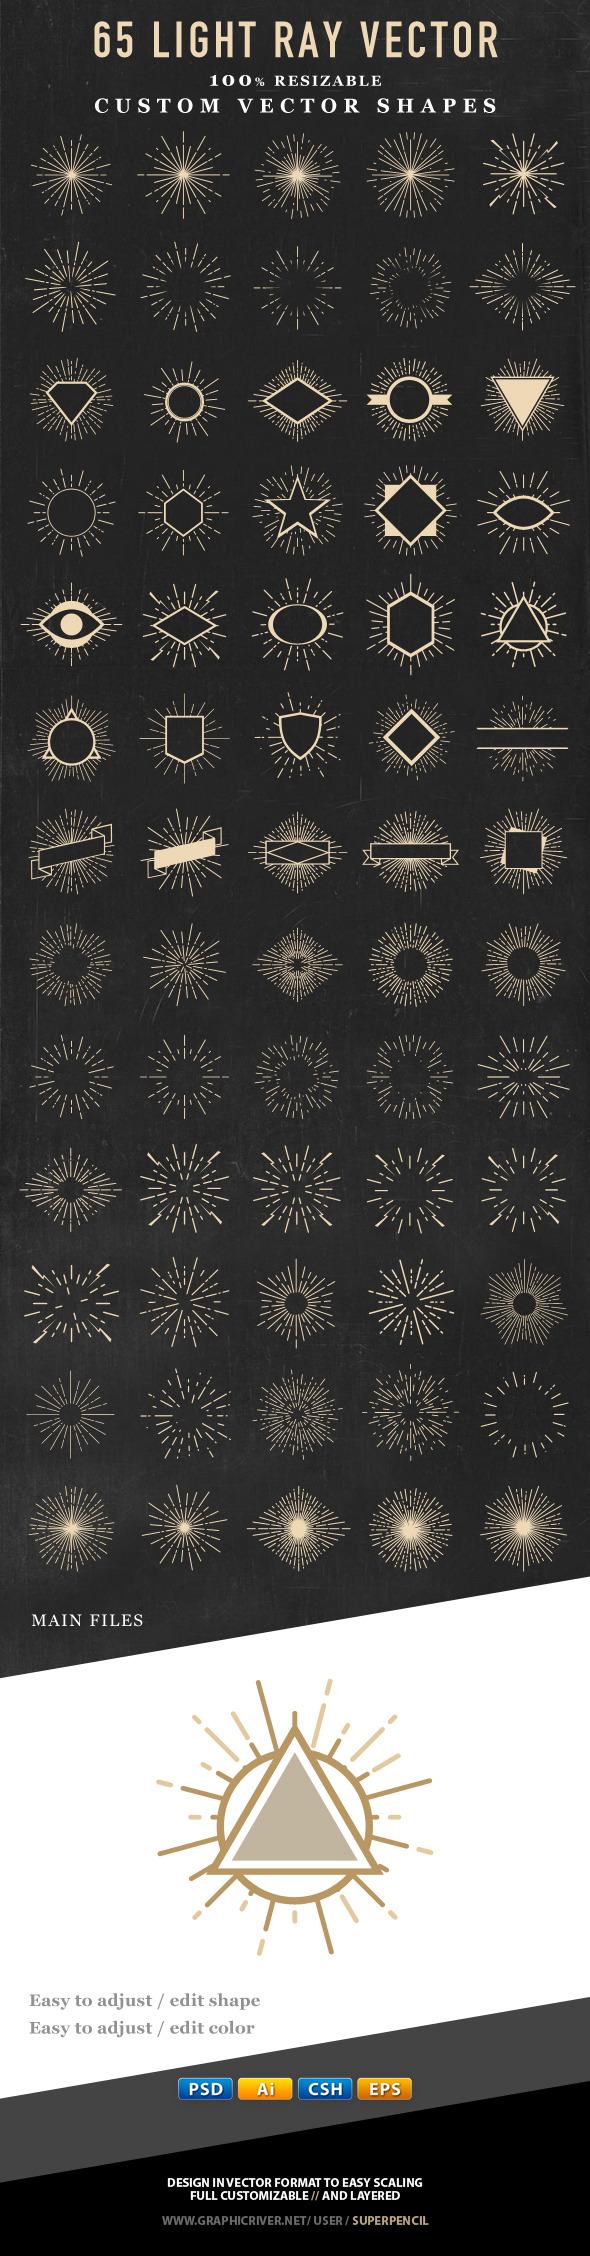 Light Ray Vector Shape - Miscellaneous Shapes